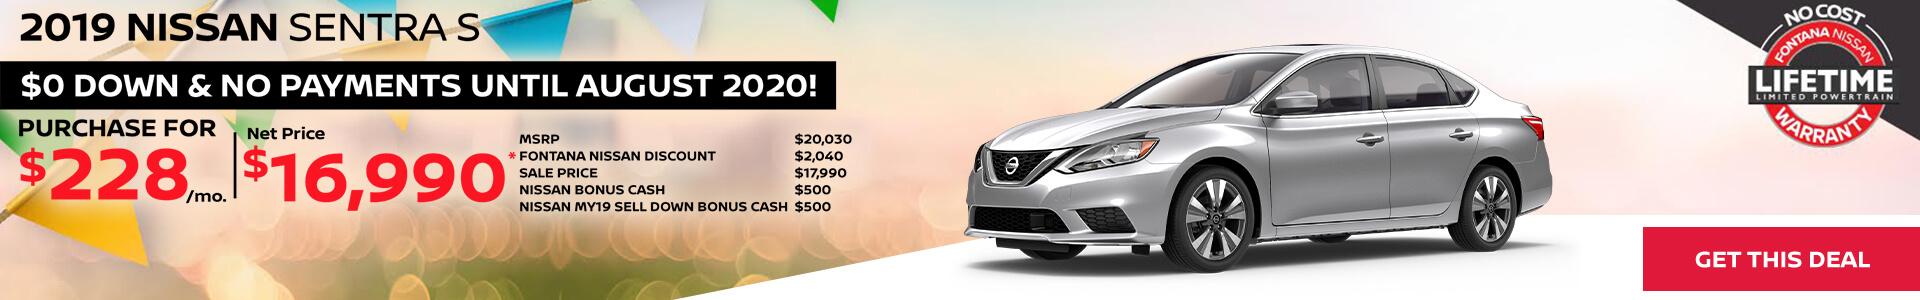 Nissan Sentra $228